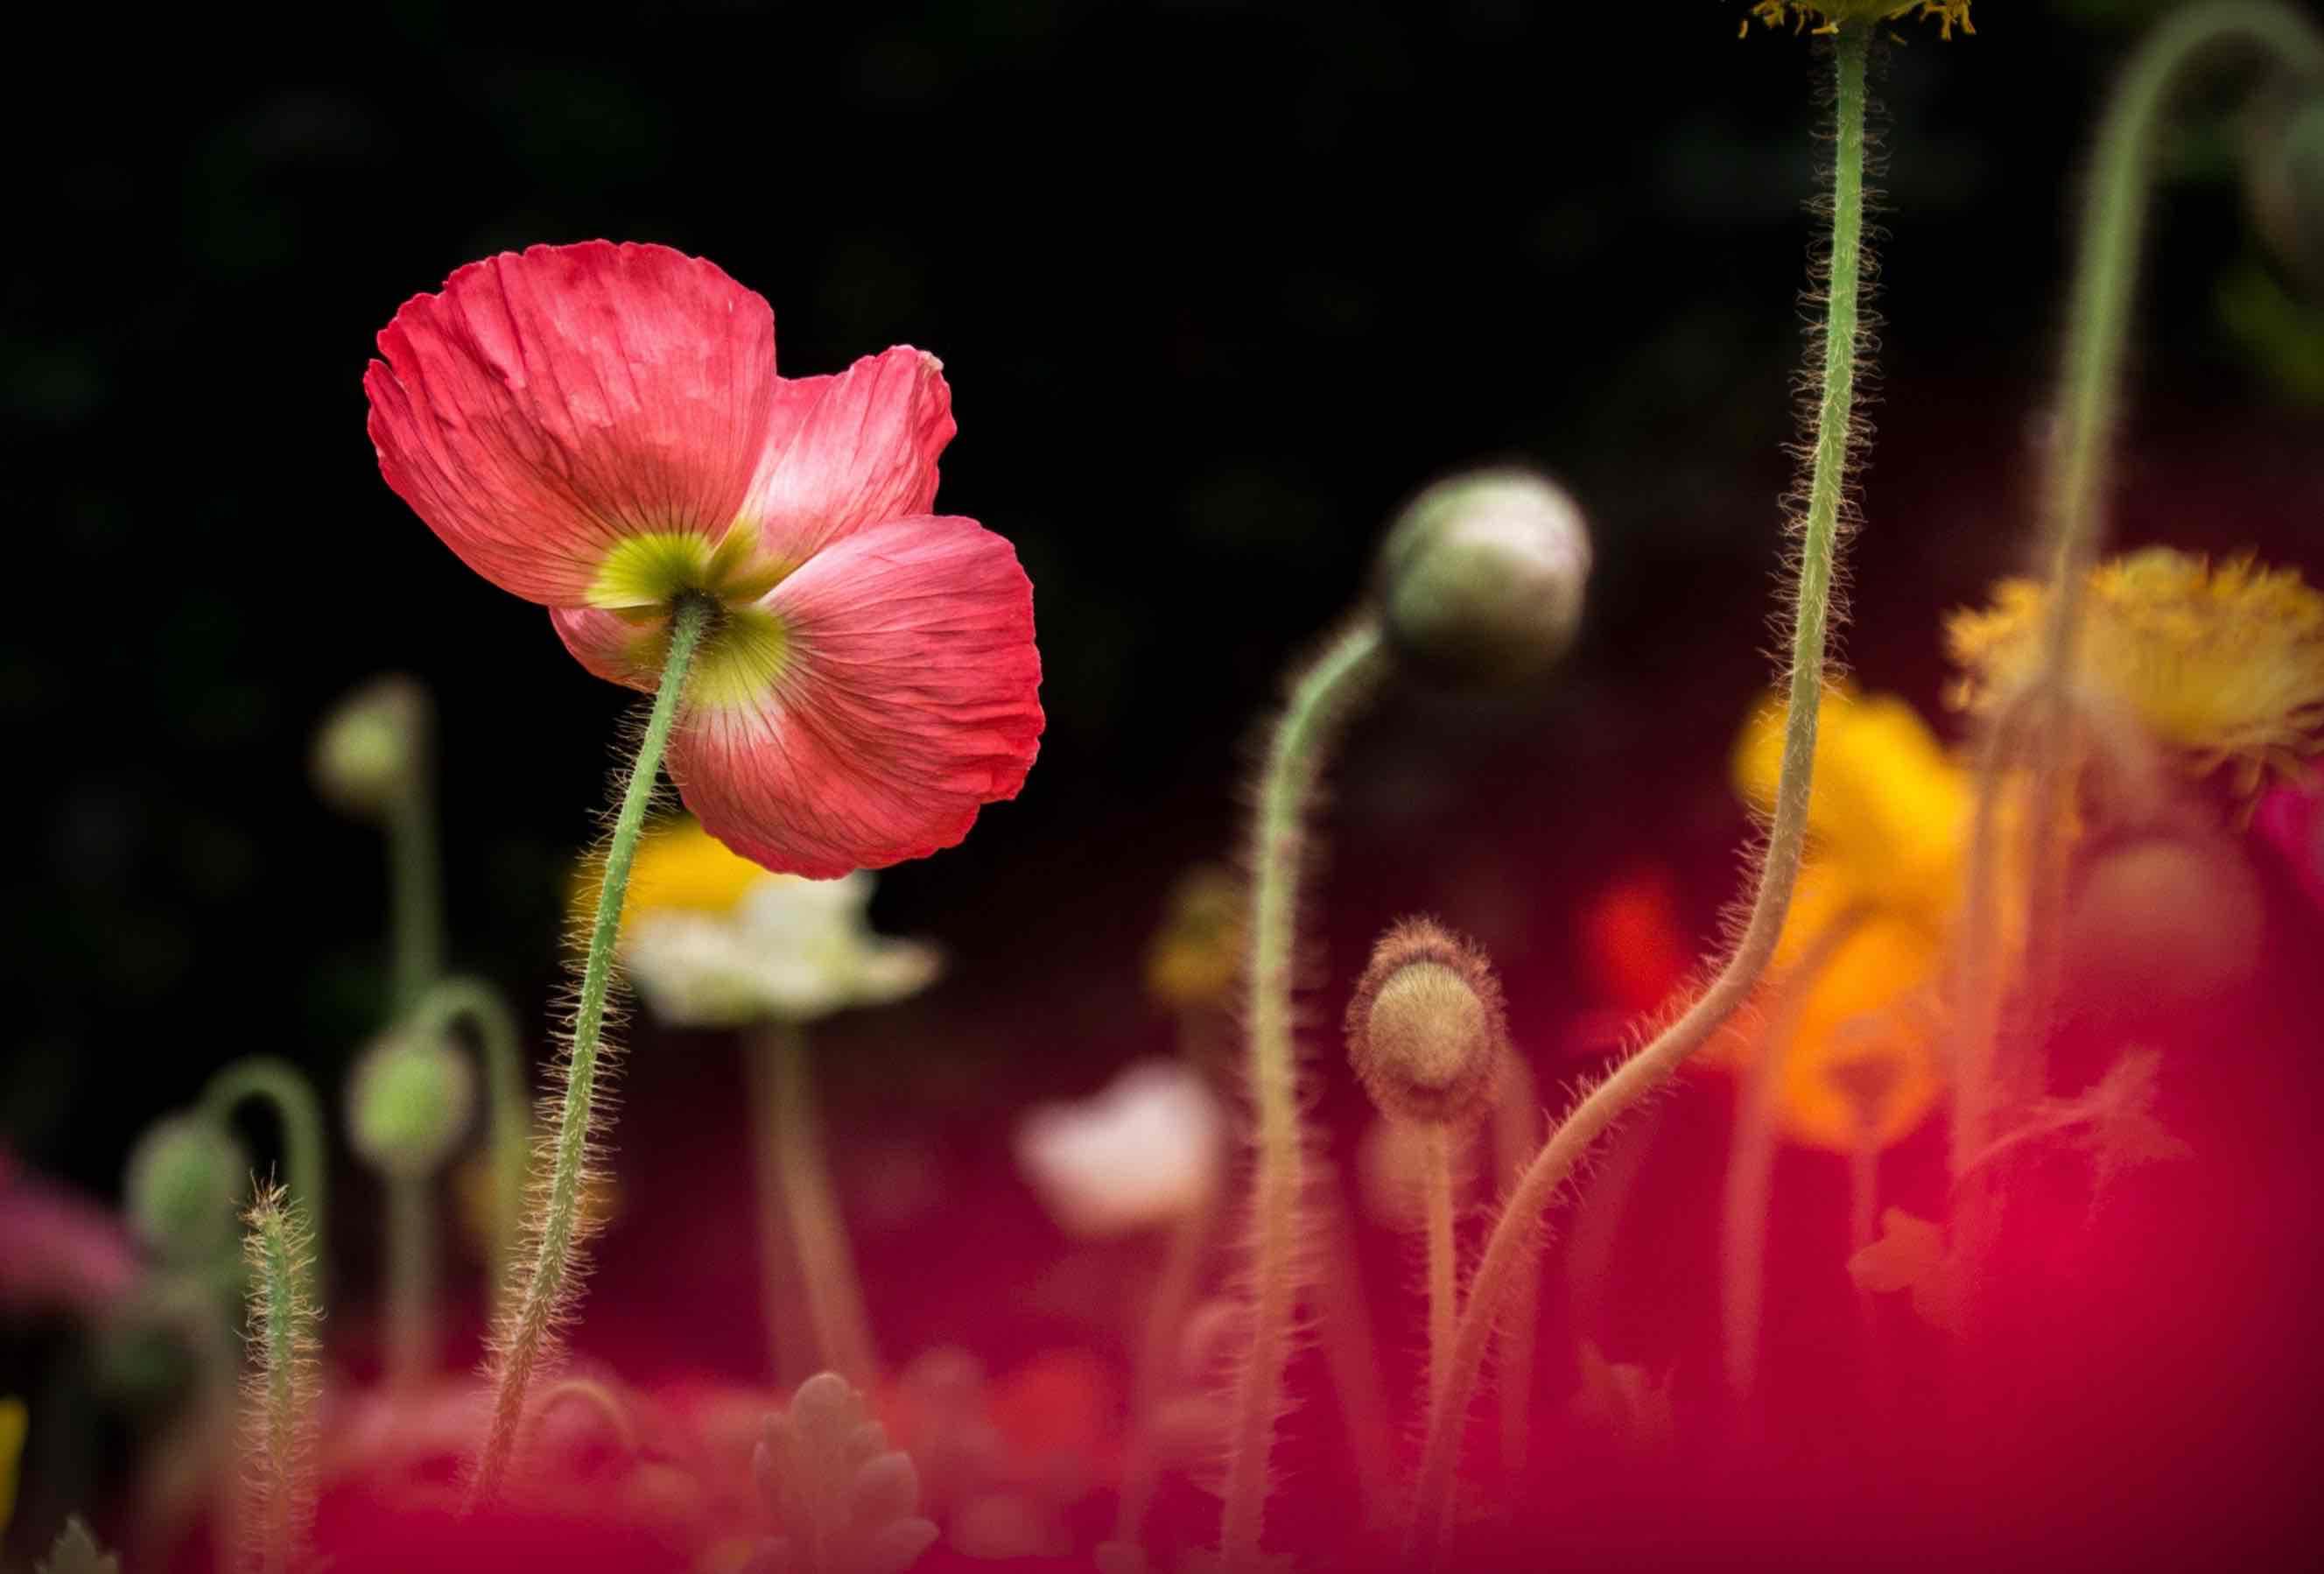 Imagenes muy lindas de flores5